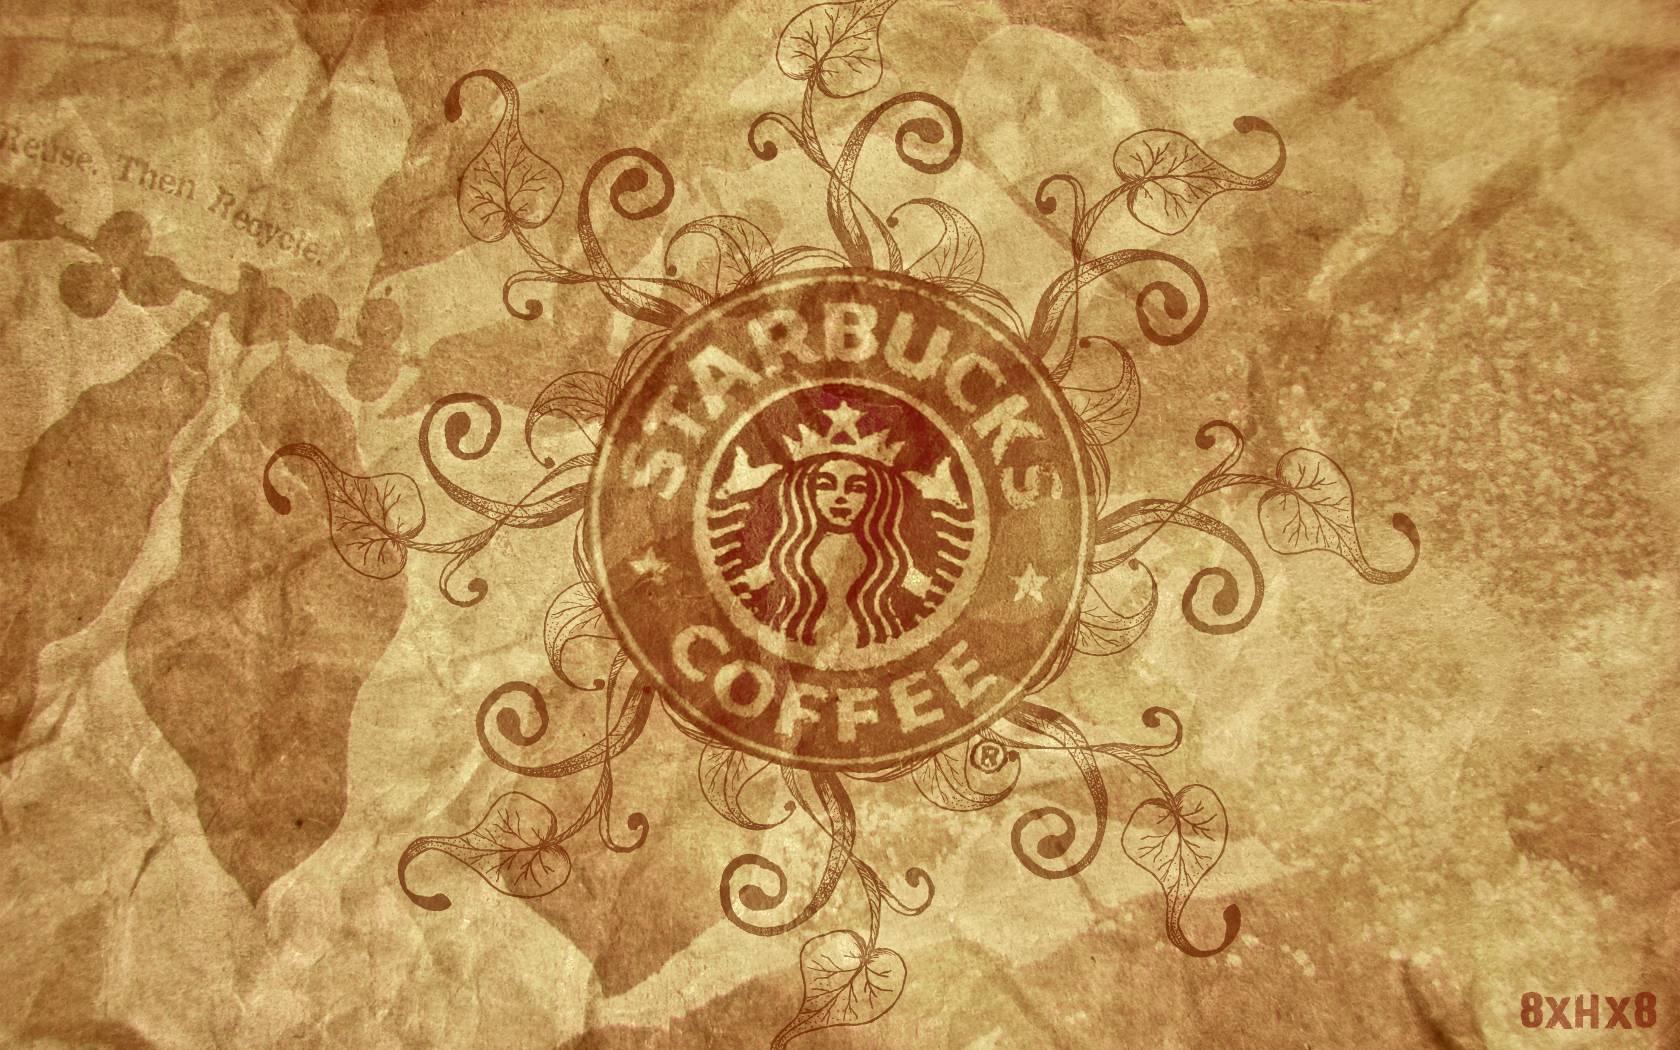 Fonds d'écran Starbucks : tous les wallpapers Starbucks